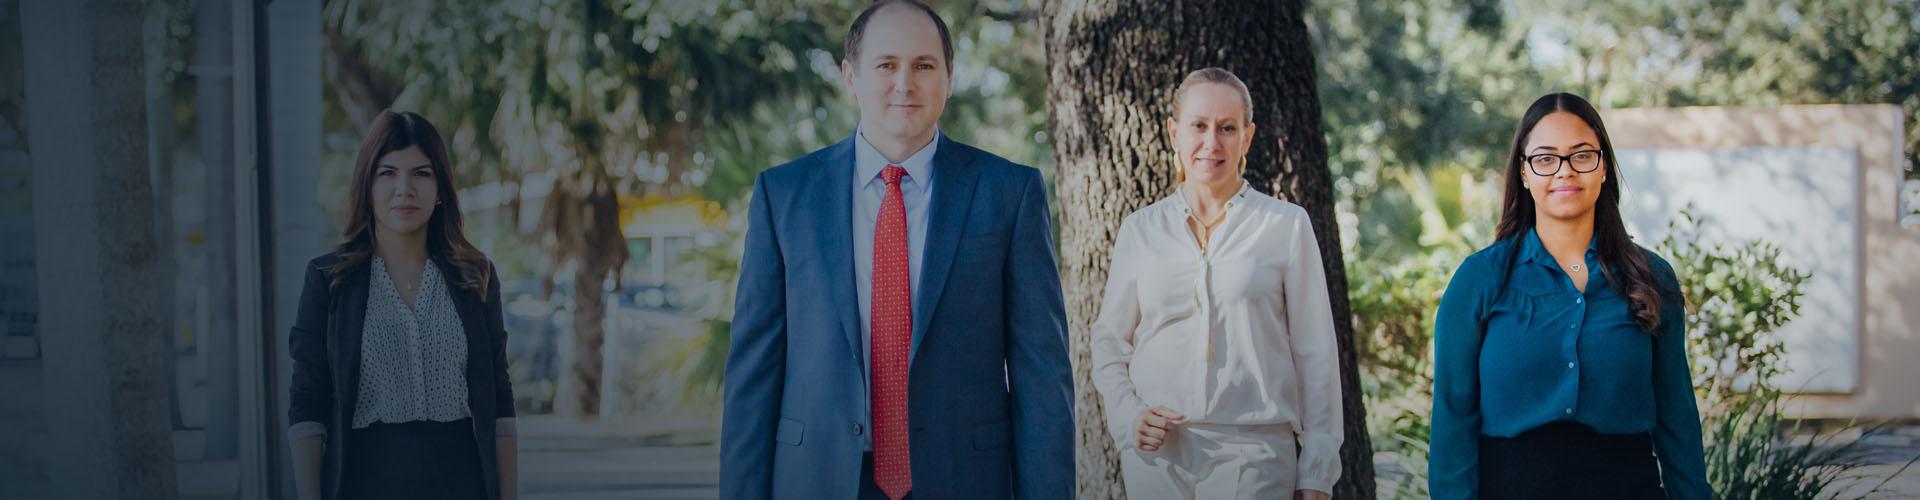 Florida Debt Consolidation Attorneys - Stiberman Law Firm